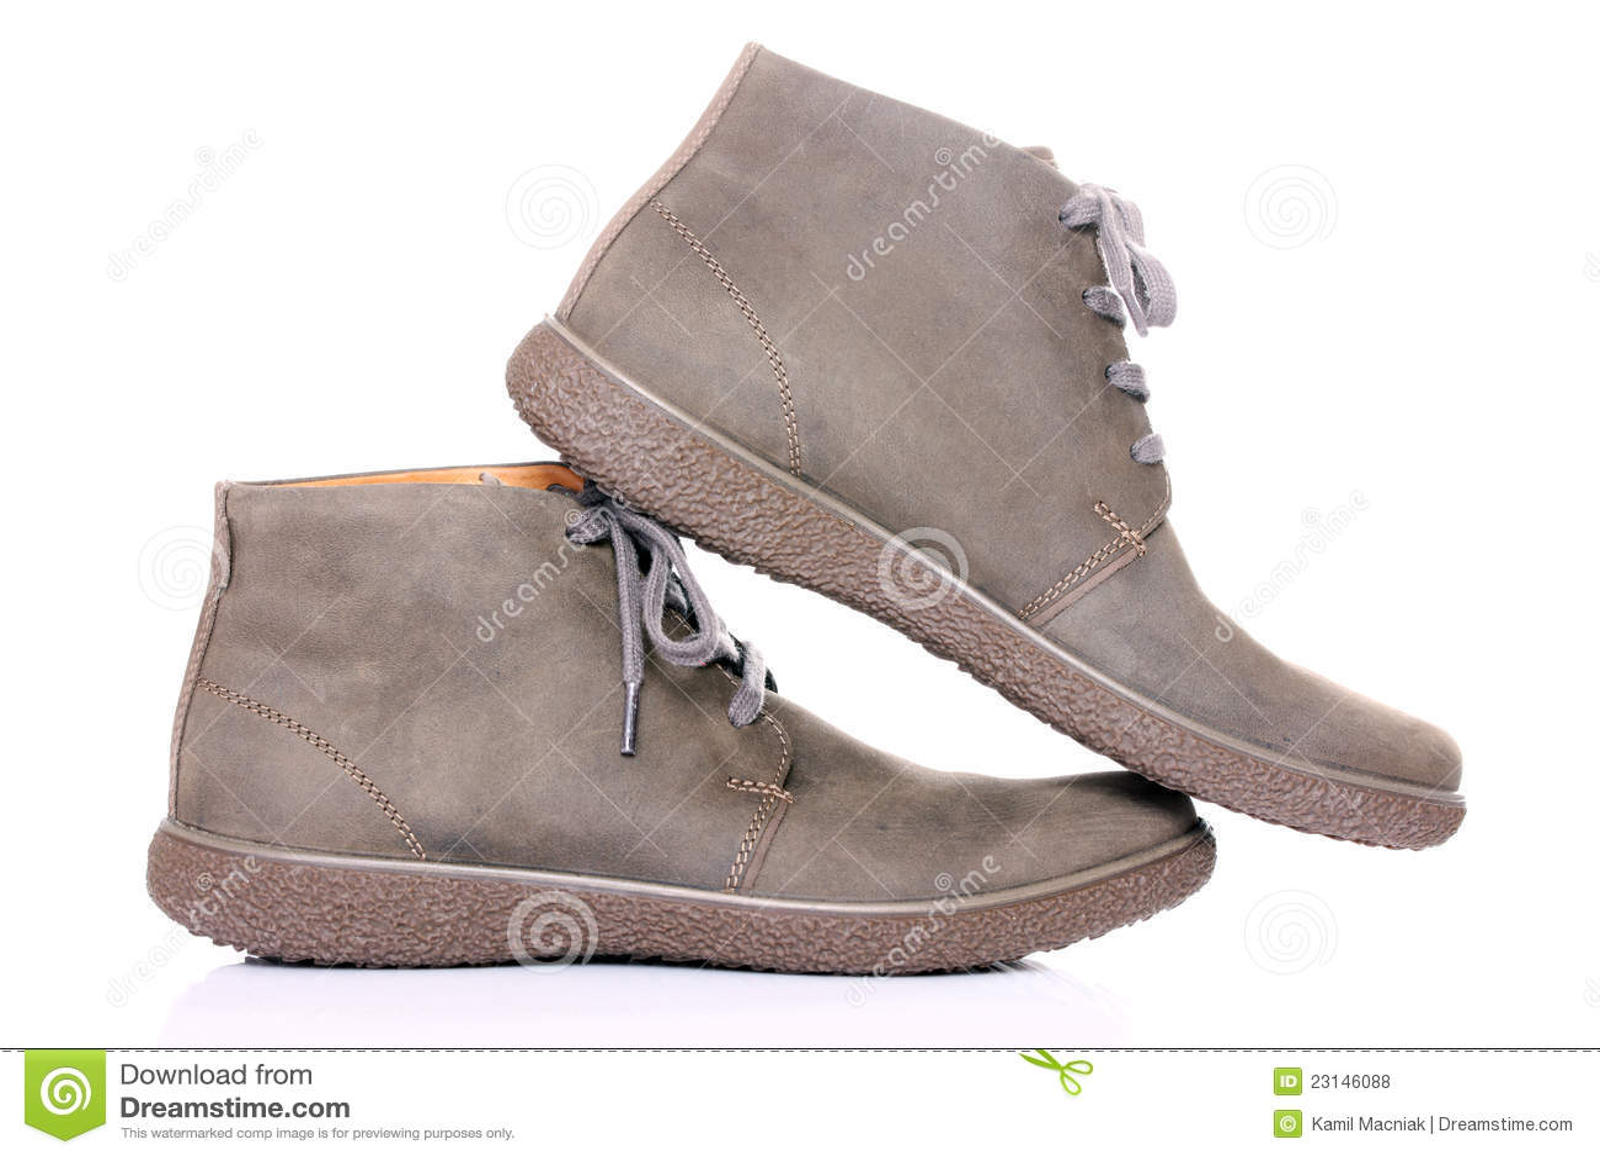 stockImage mâlebrun Chaussures photo de l'hiver du LqzpSUMjVG